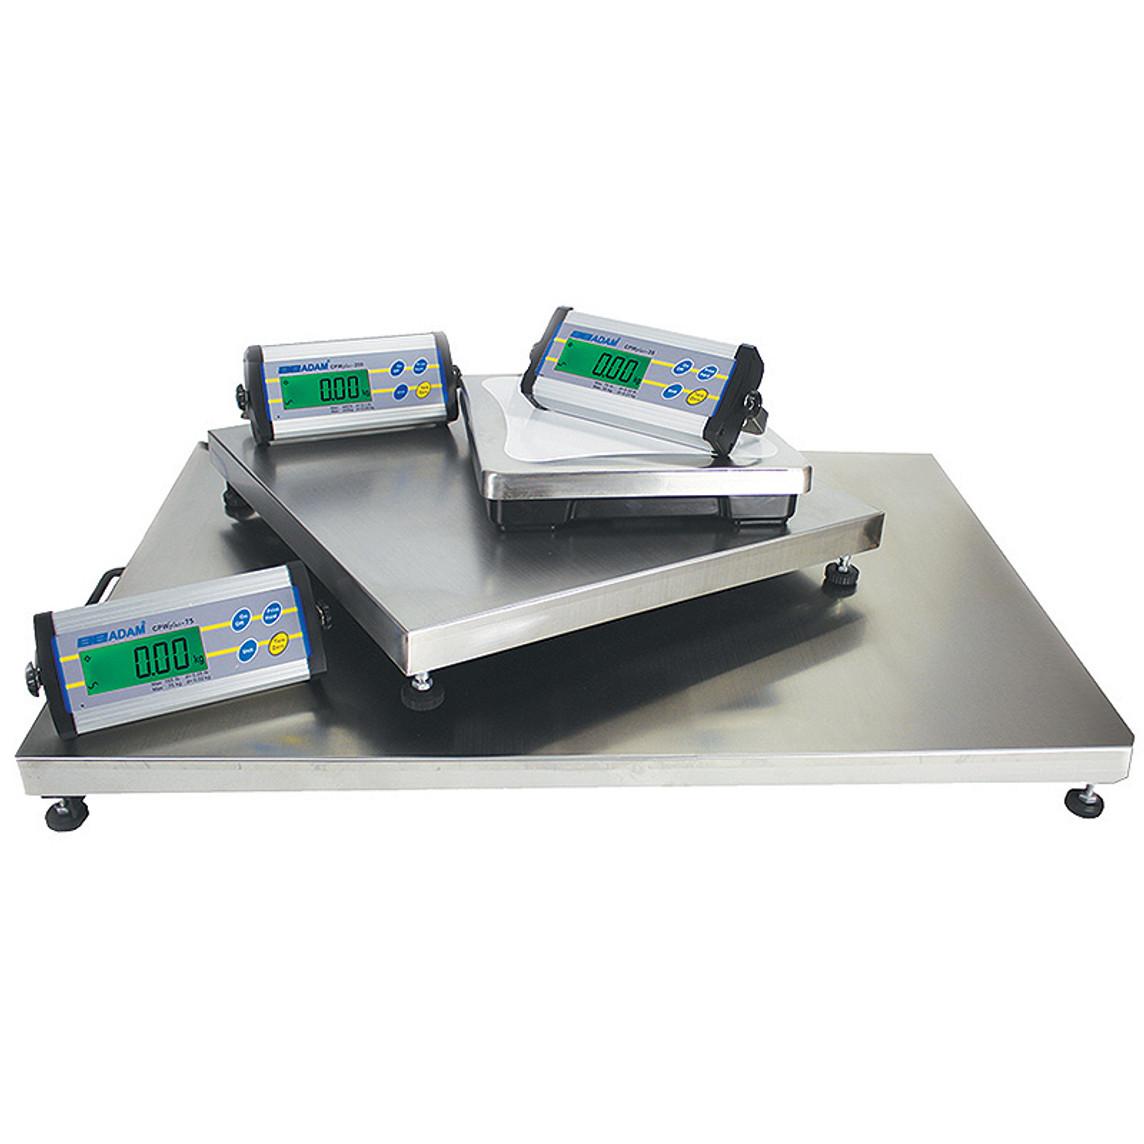 CPWplus 200 Portable Platform Bench Scale 200kg x 50g